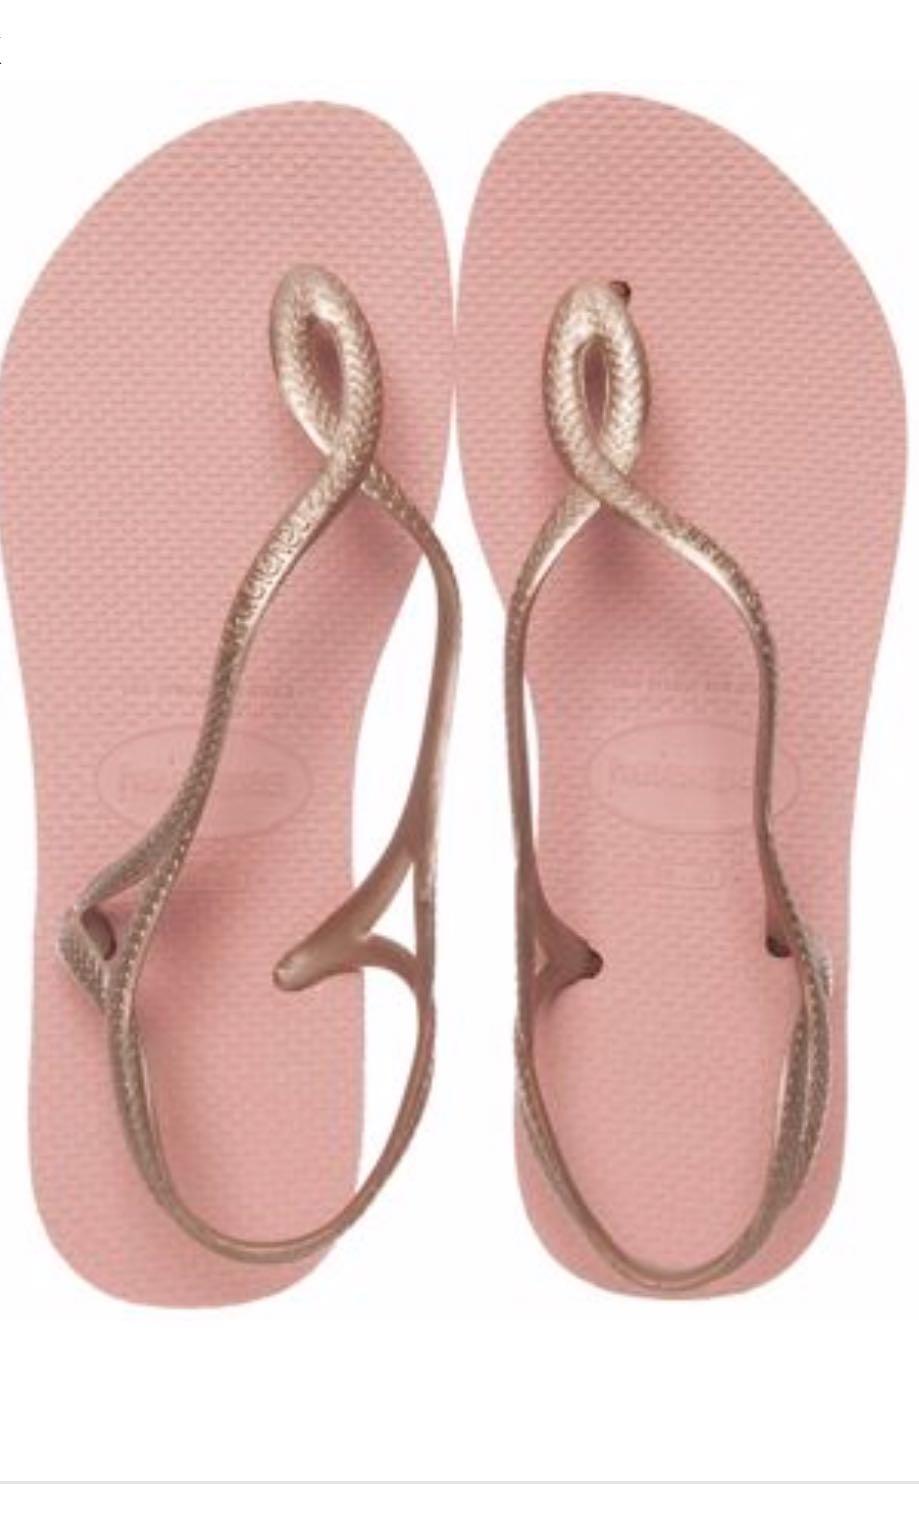 a93dd42f2 Home · Women s Fashion · Shoes · Flats   Sandals. photo photo photo photo  photo